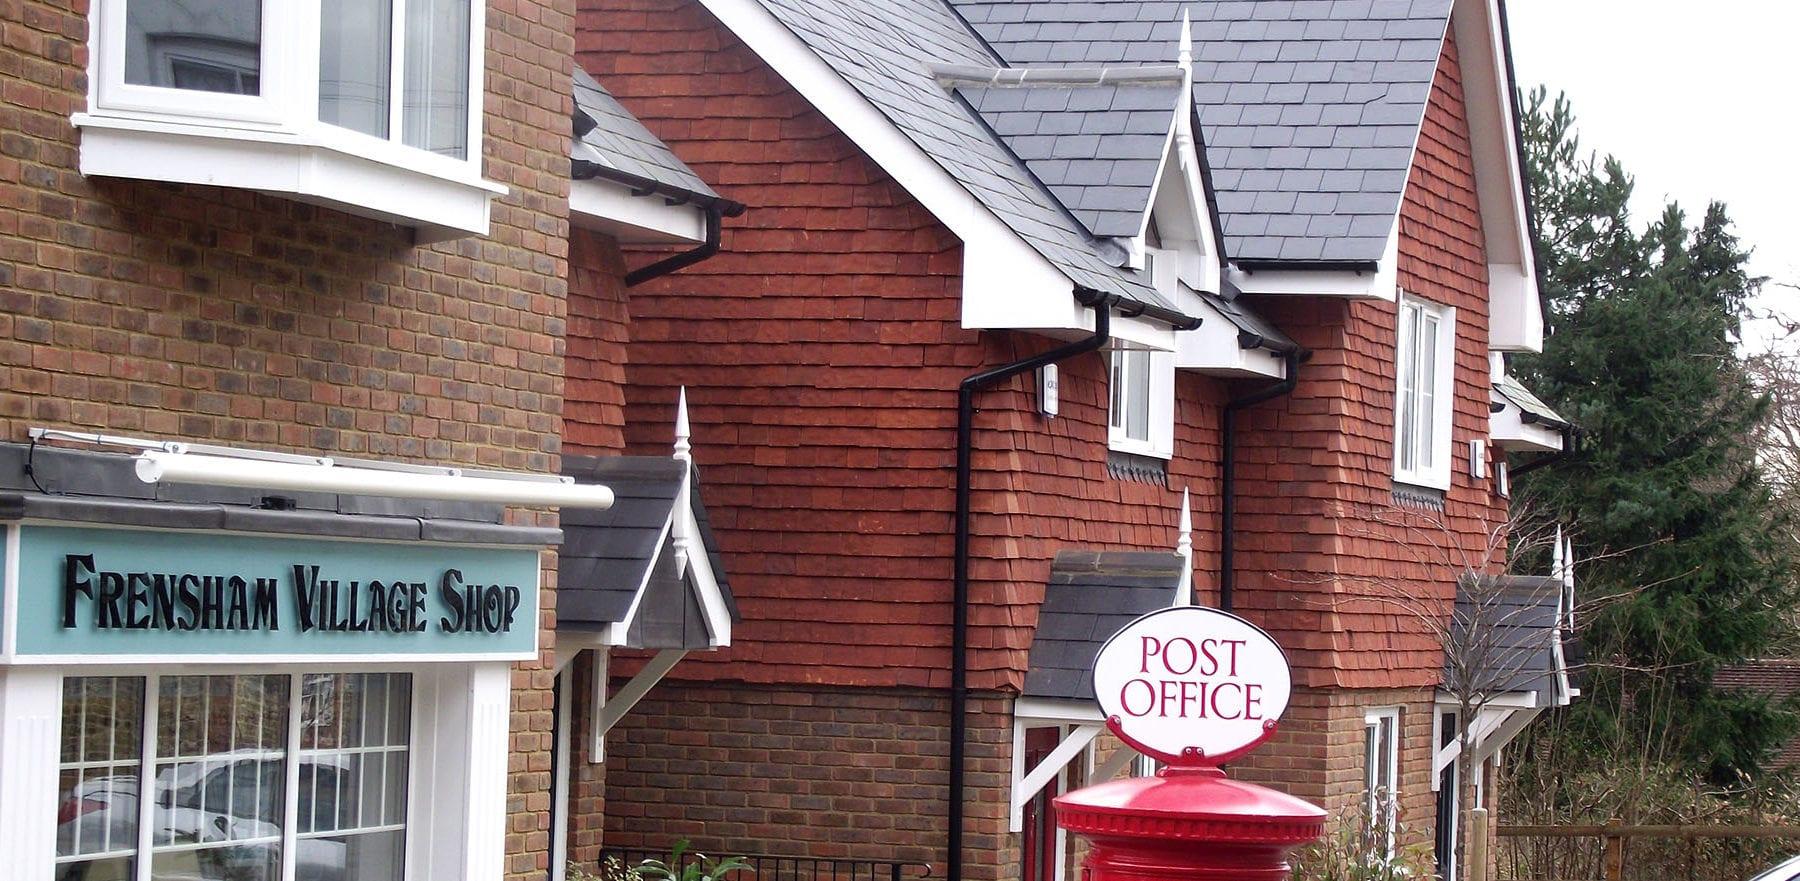 Lifestiles - Handmade Red Clay Roof Tiles - Frensham, England 3